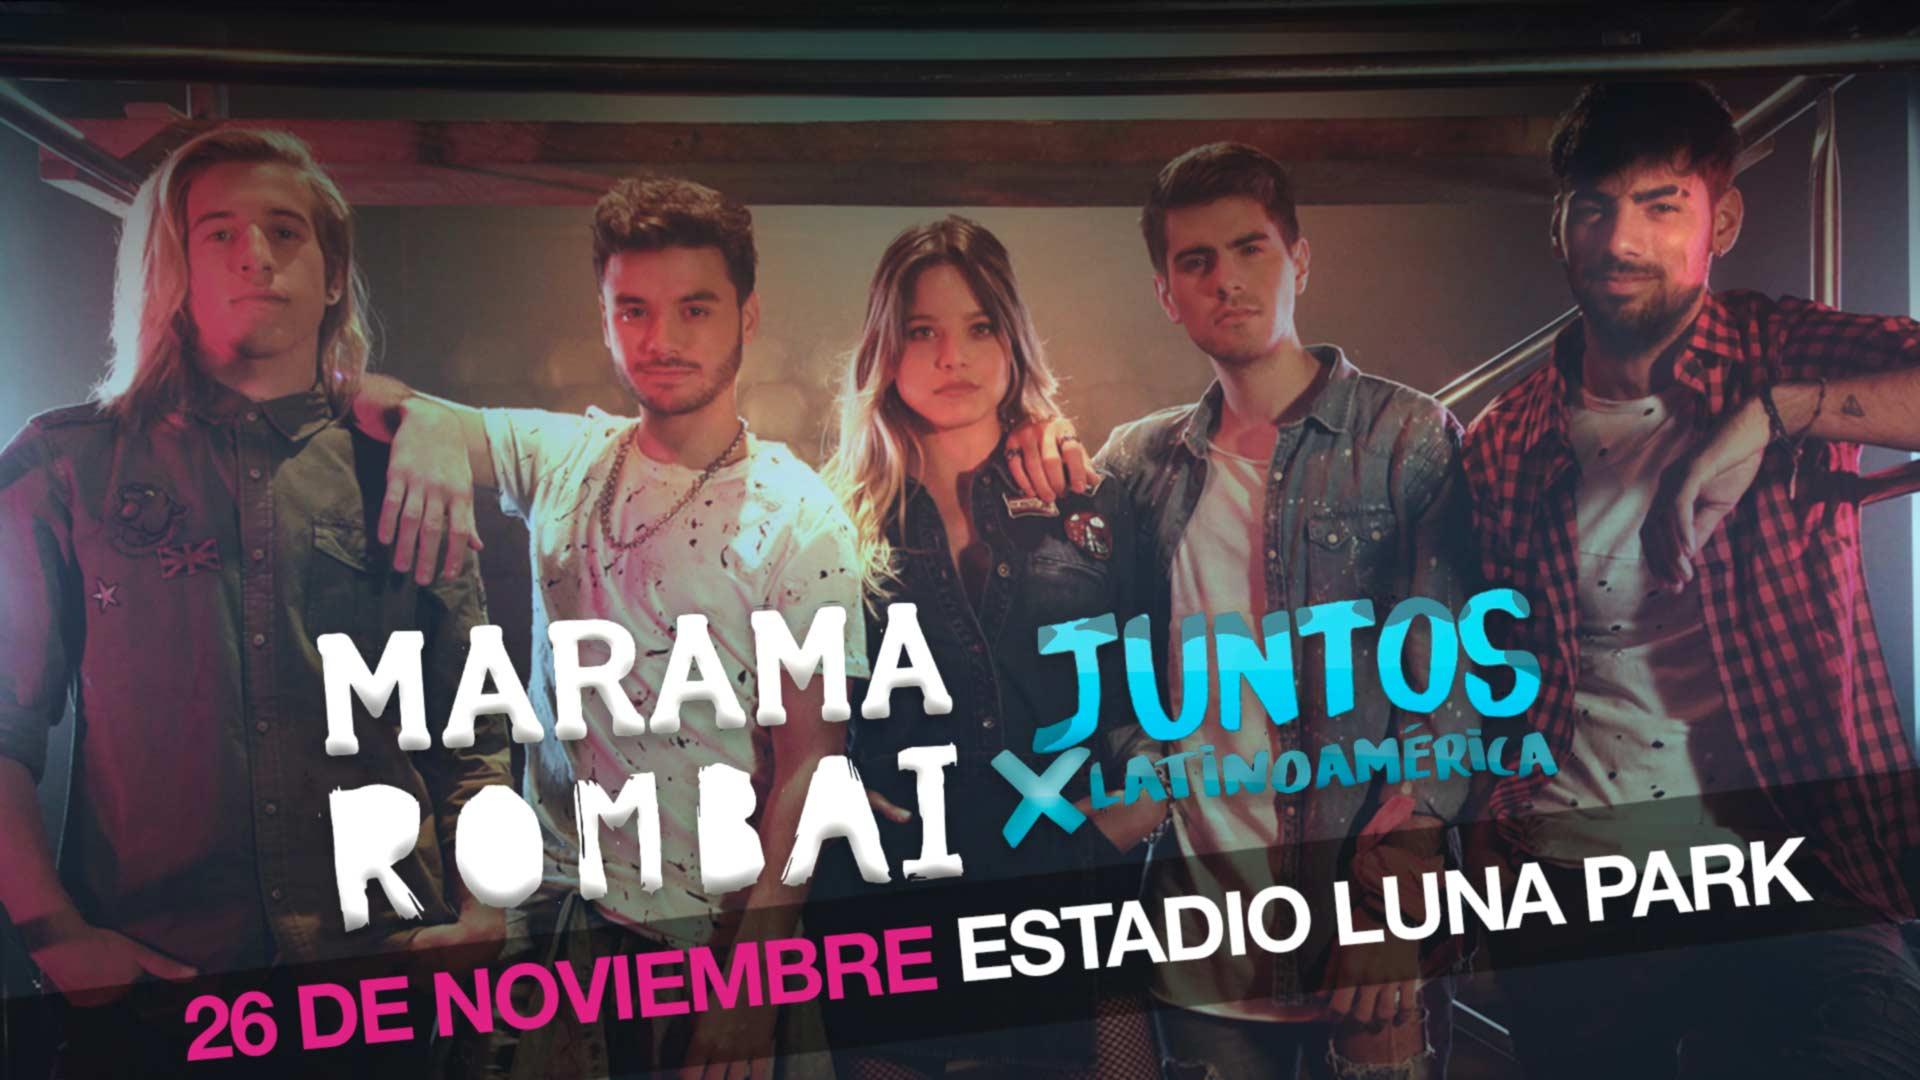 Marama Tour